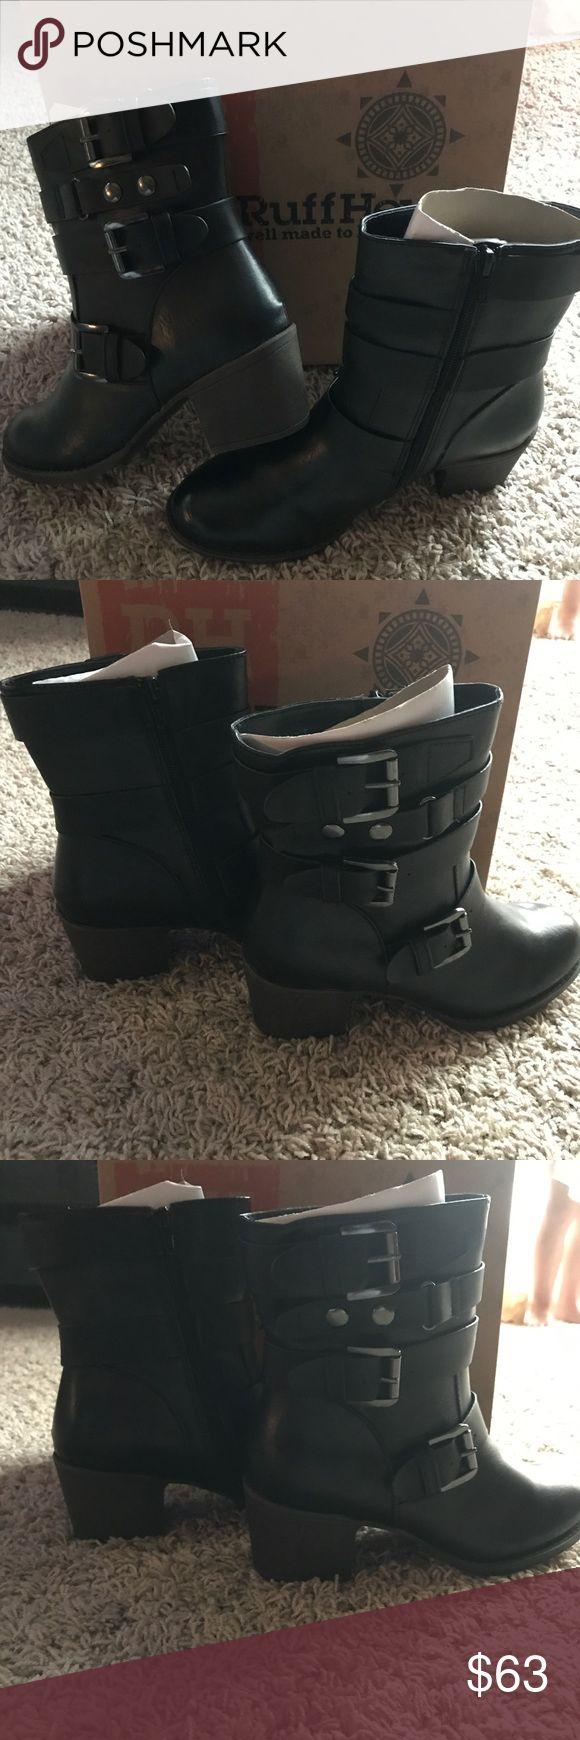 NWB Ruff Hewn Black Buckle Heel Boot 7-8 Available NWB Ruff Hewn Black Buckle Healed Boots, Sizes 7 & 8 Available. Ruff Hewn Shoes Heeled Boots